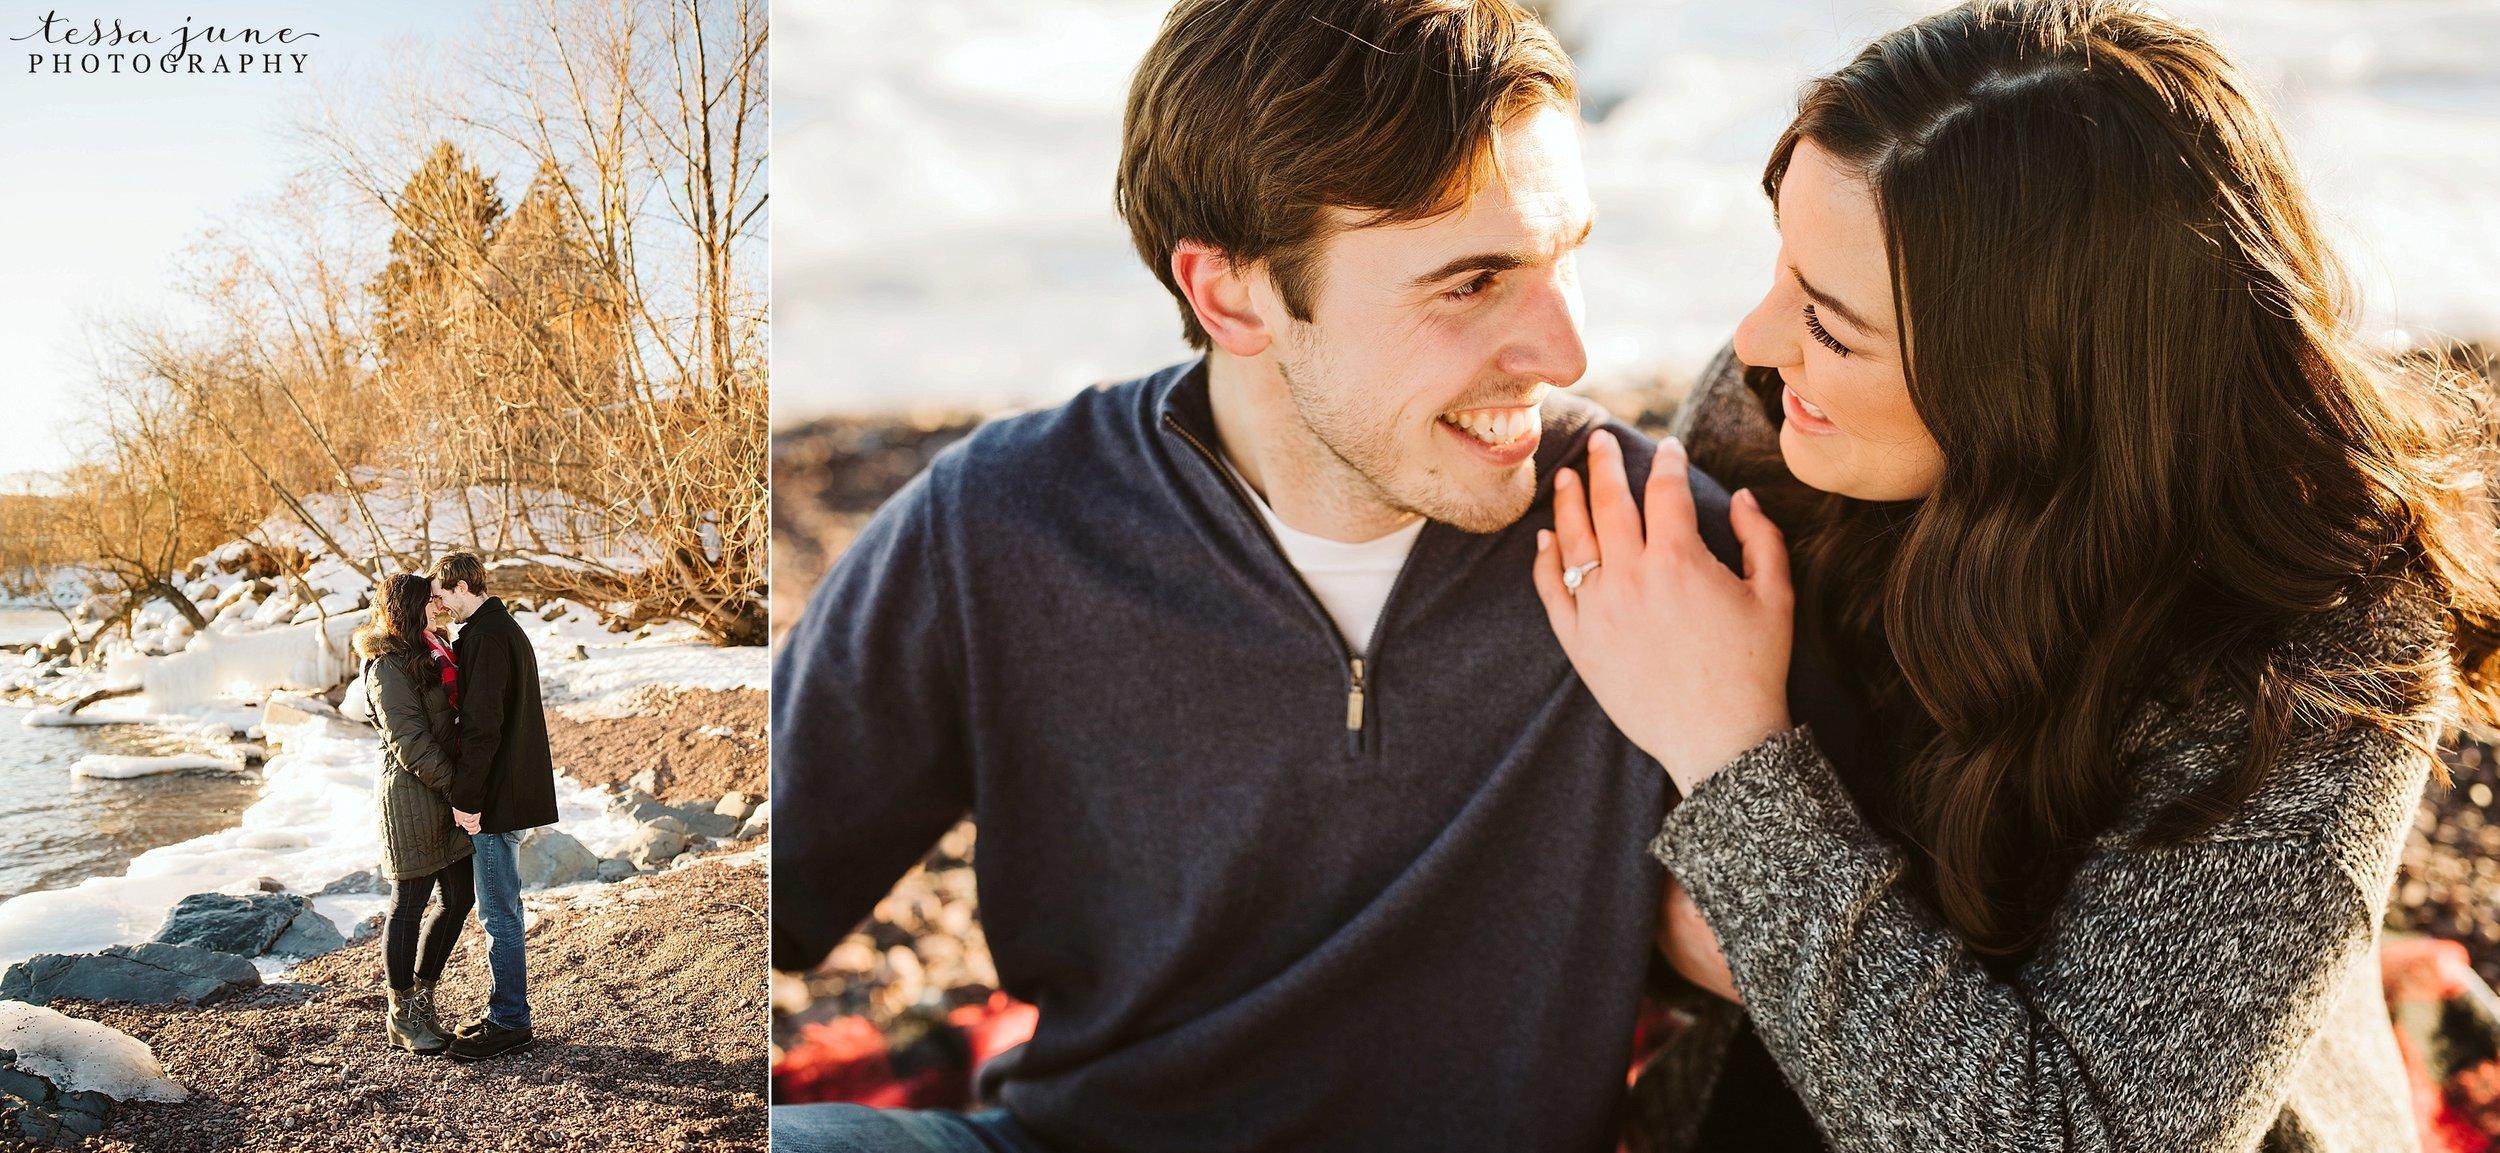 winter-duluth-engagement-at-park-pointe-snow-aly-alex-18.jpg